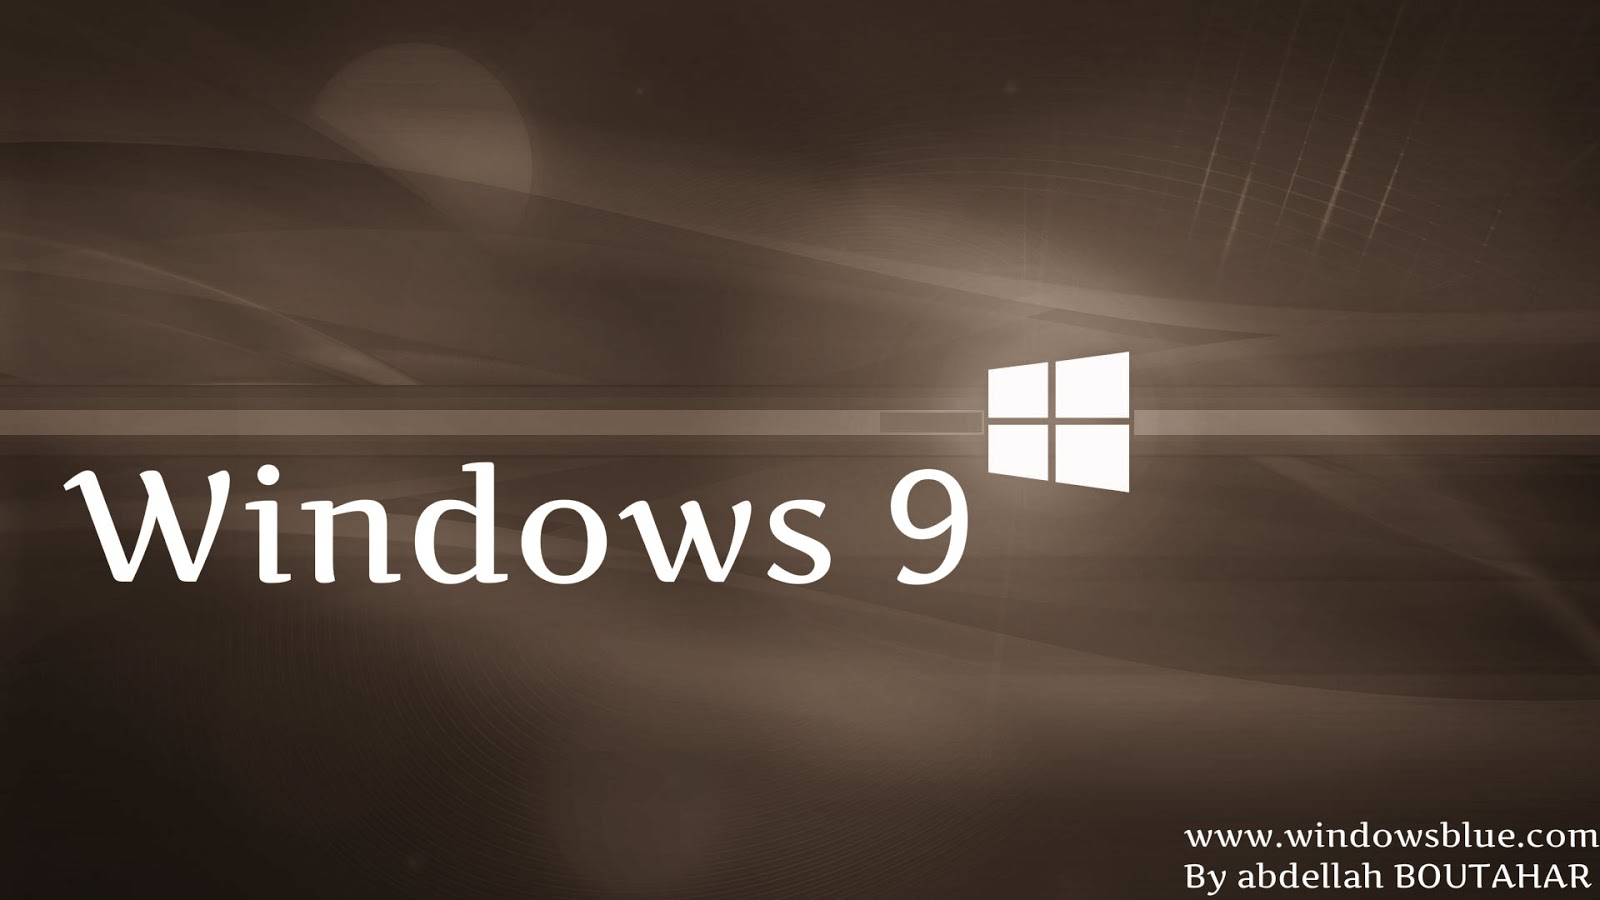 windows 9 full - photo #6